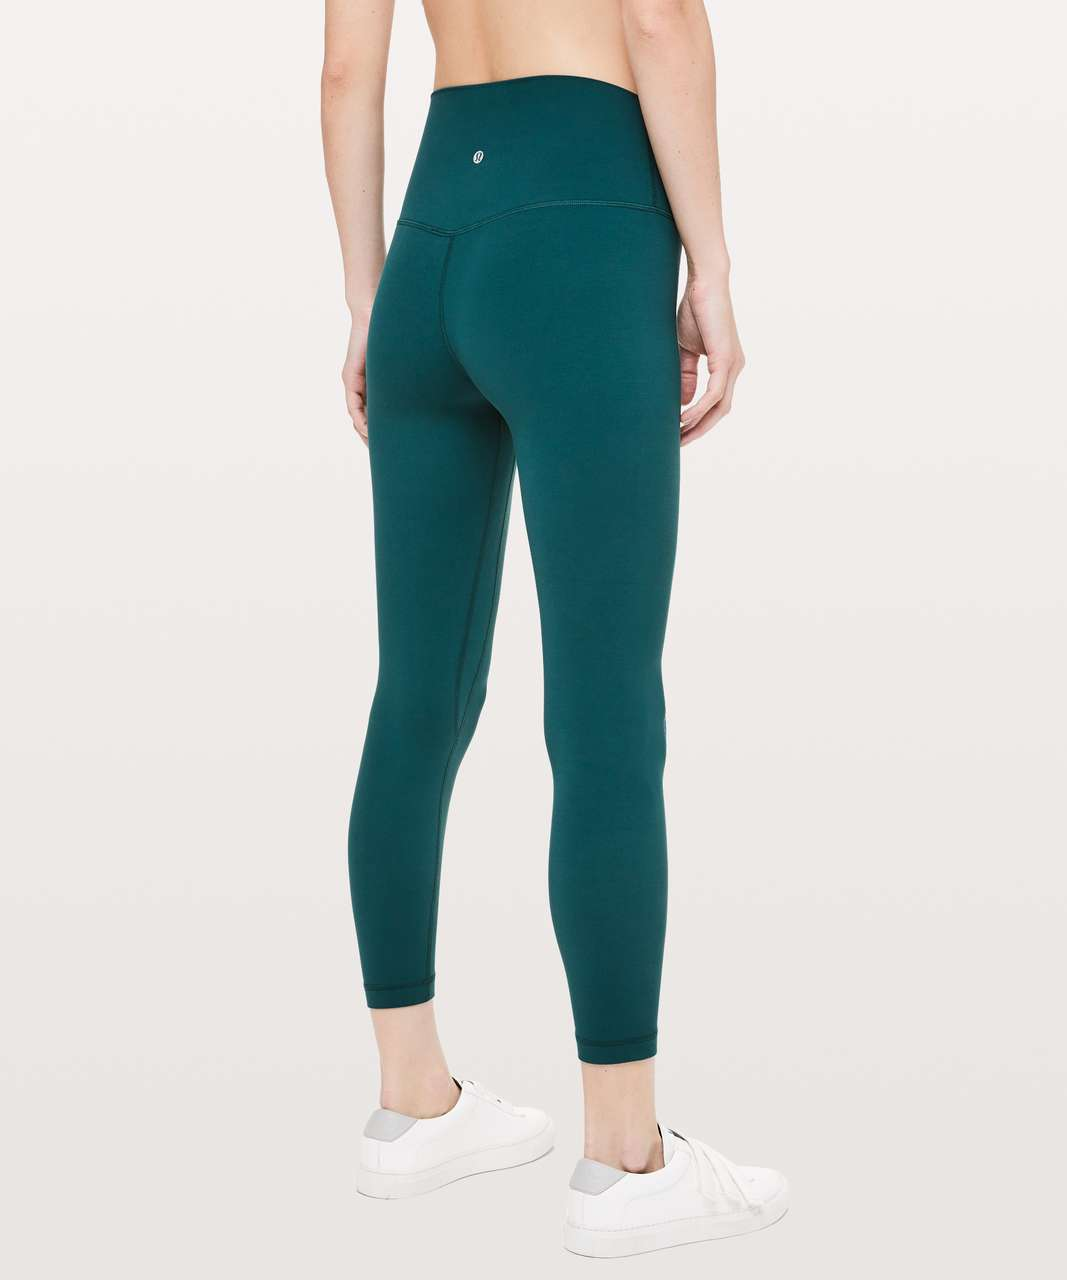 "Lululemon Align Pant II *25"" - Royal Emerald"